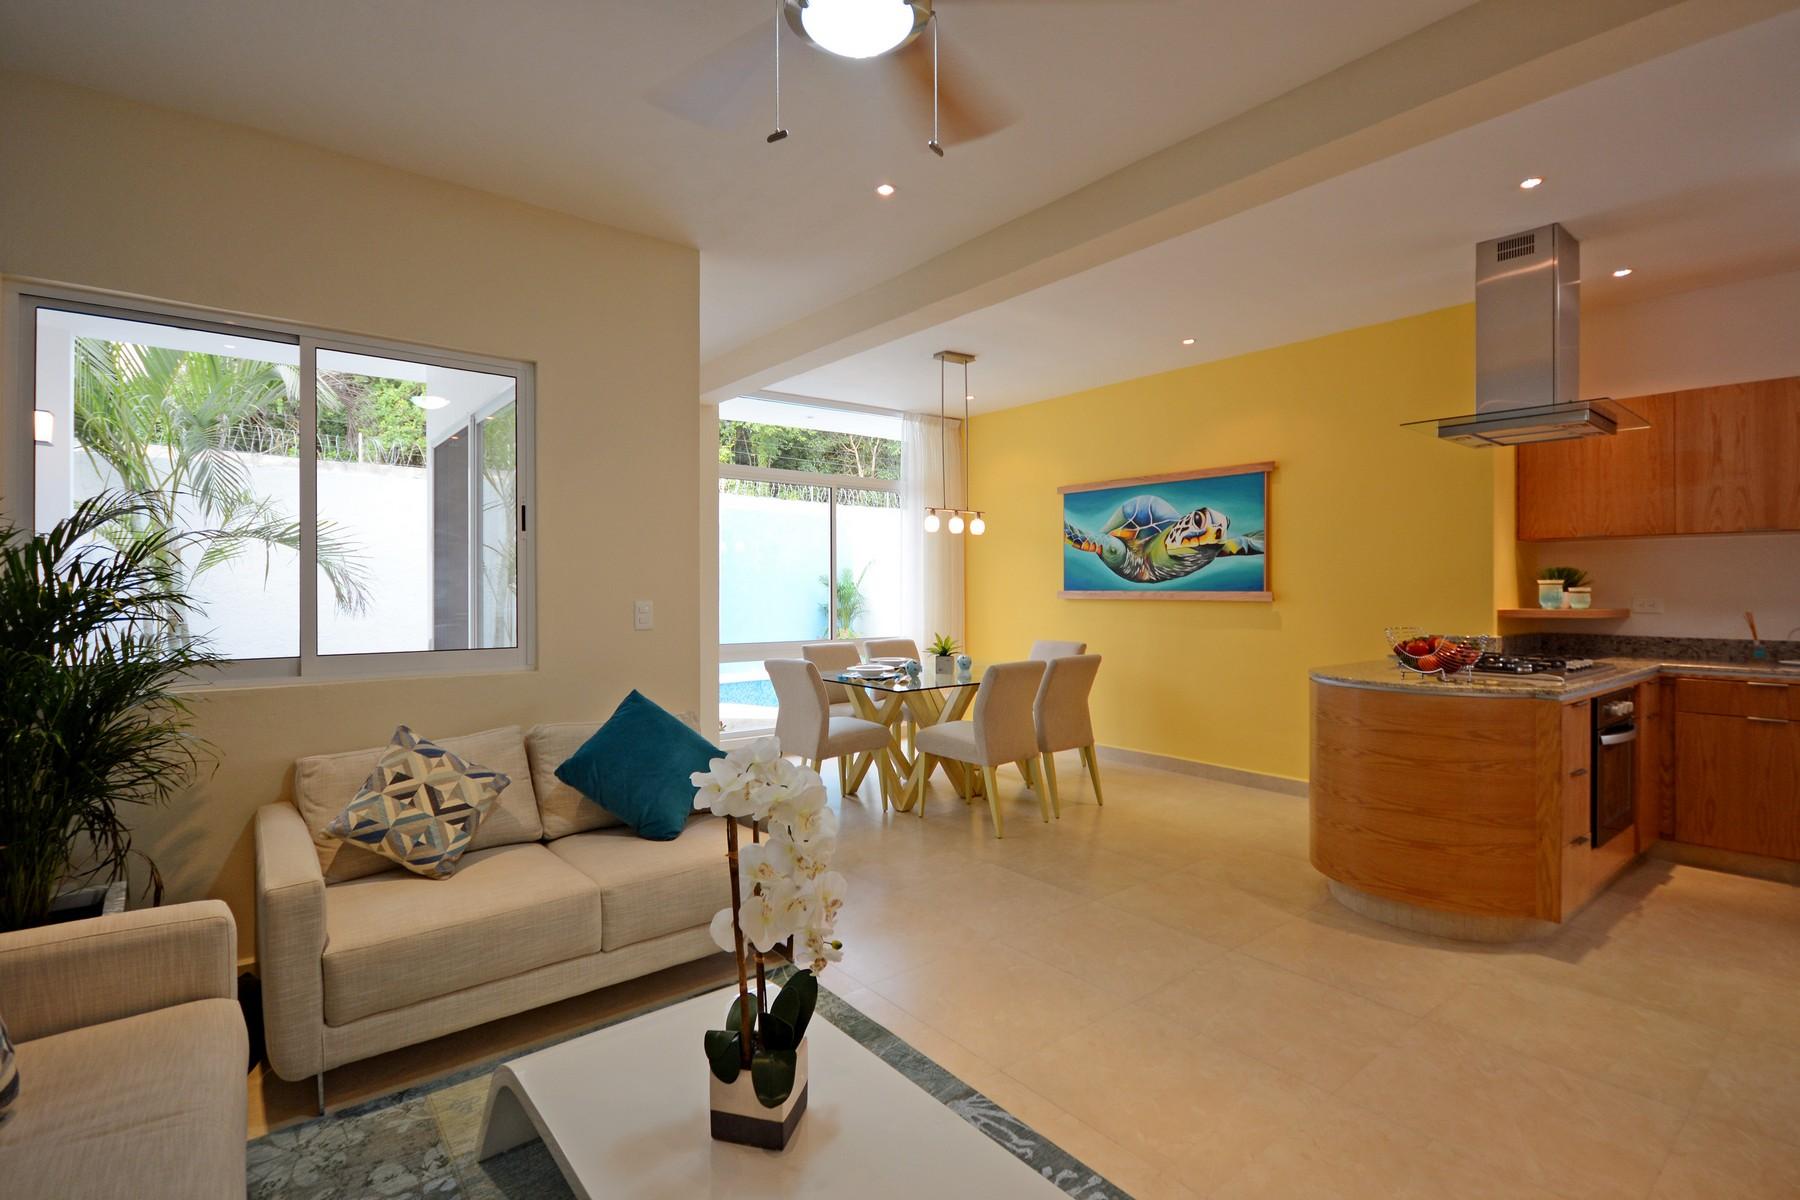 Single Family Home for Sale at LUXURY VILLA IN A GATED COMMUNITY Privada Orquídeas Selvamar Playa Del Carmen, Quintana Roo, 77710 Mexico